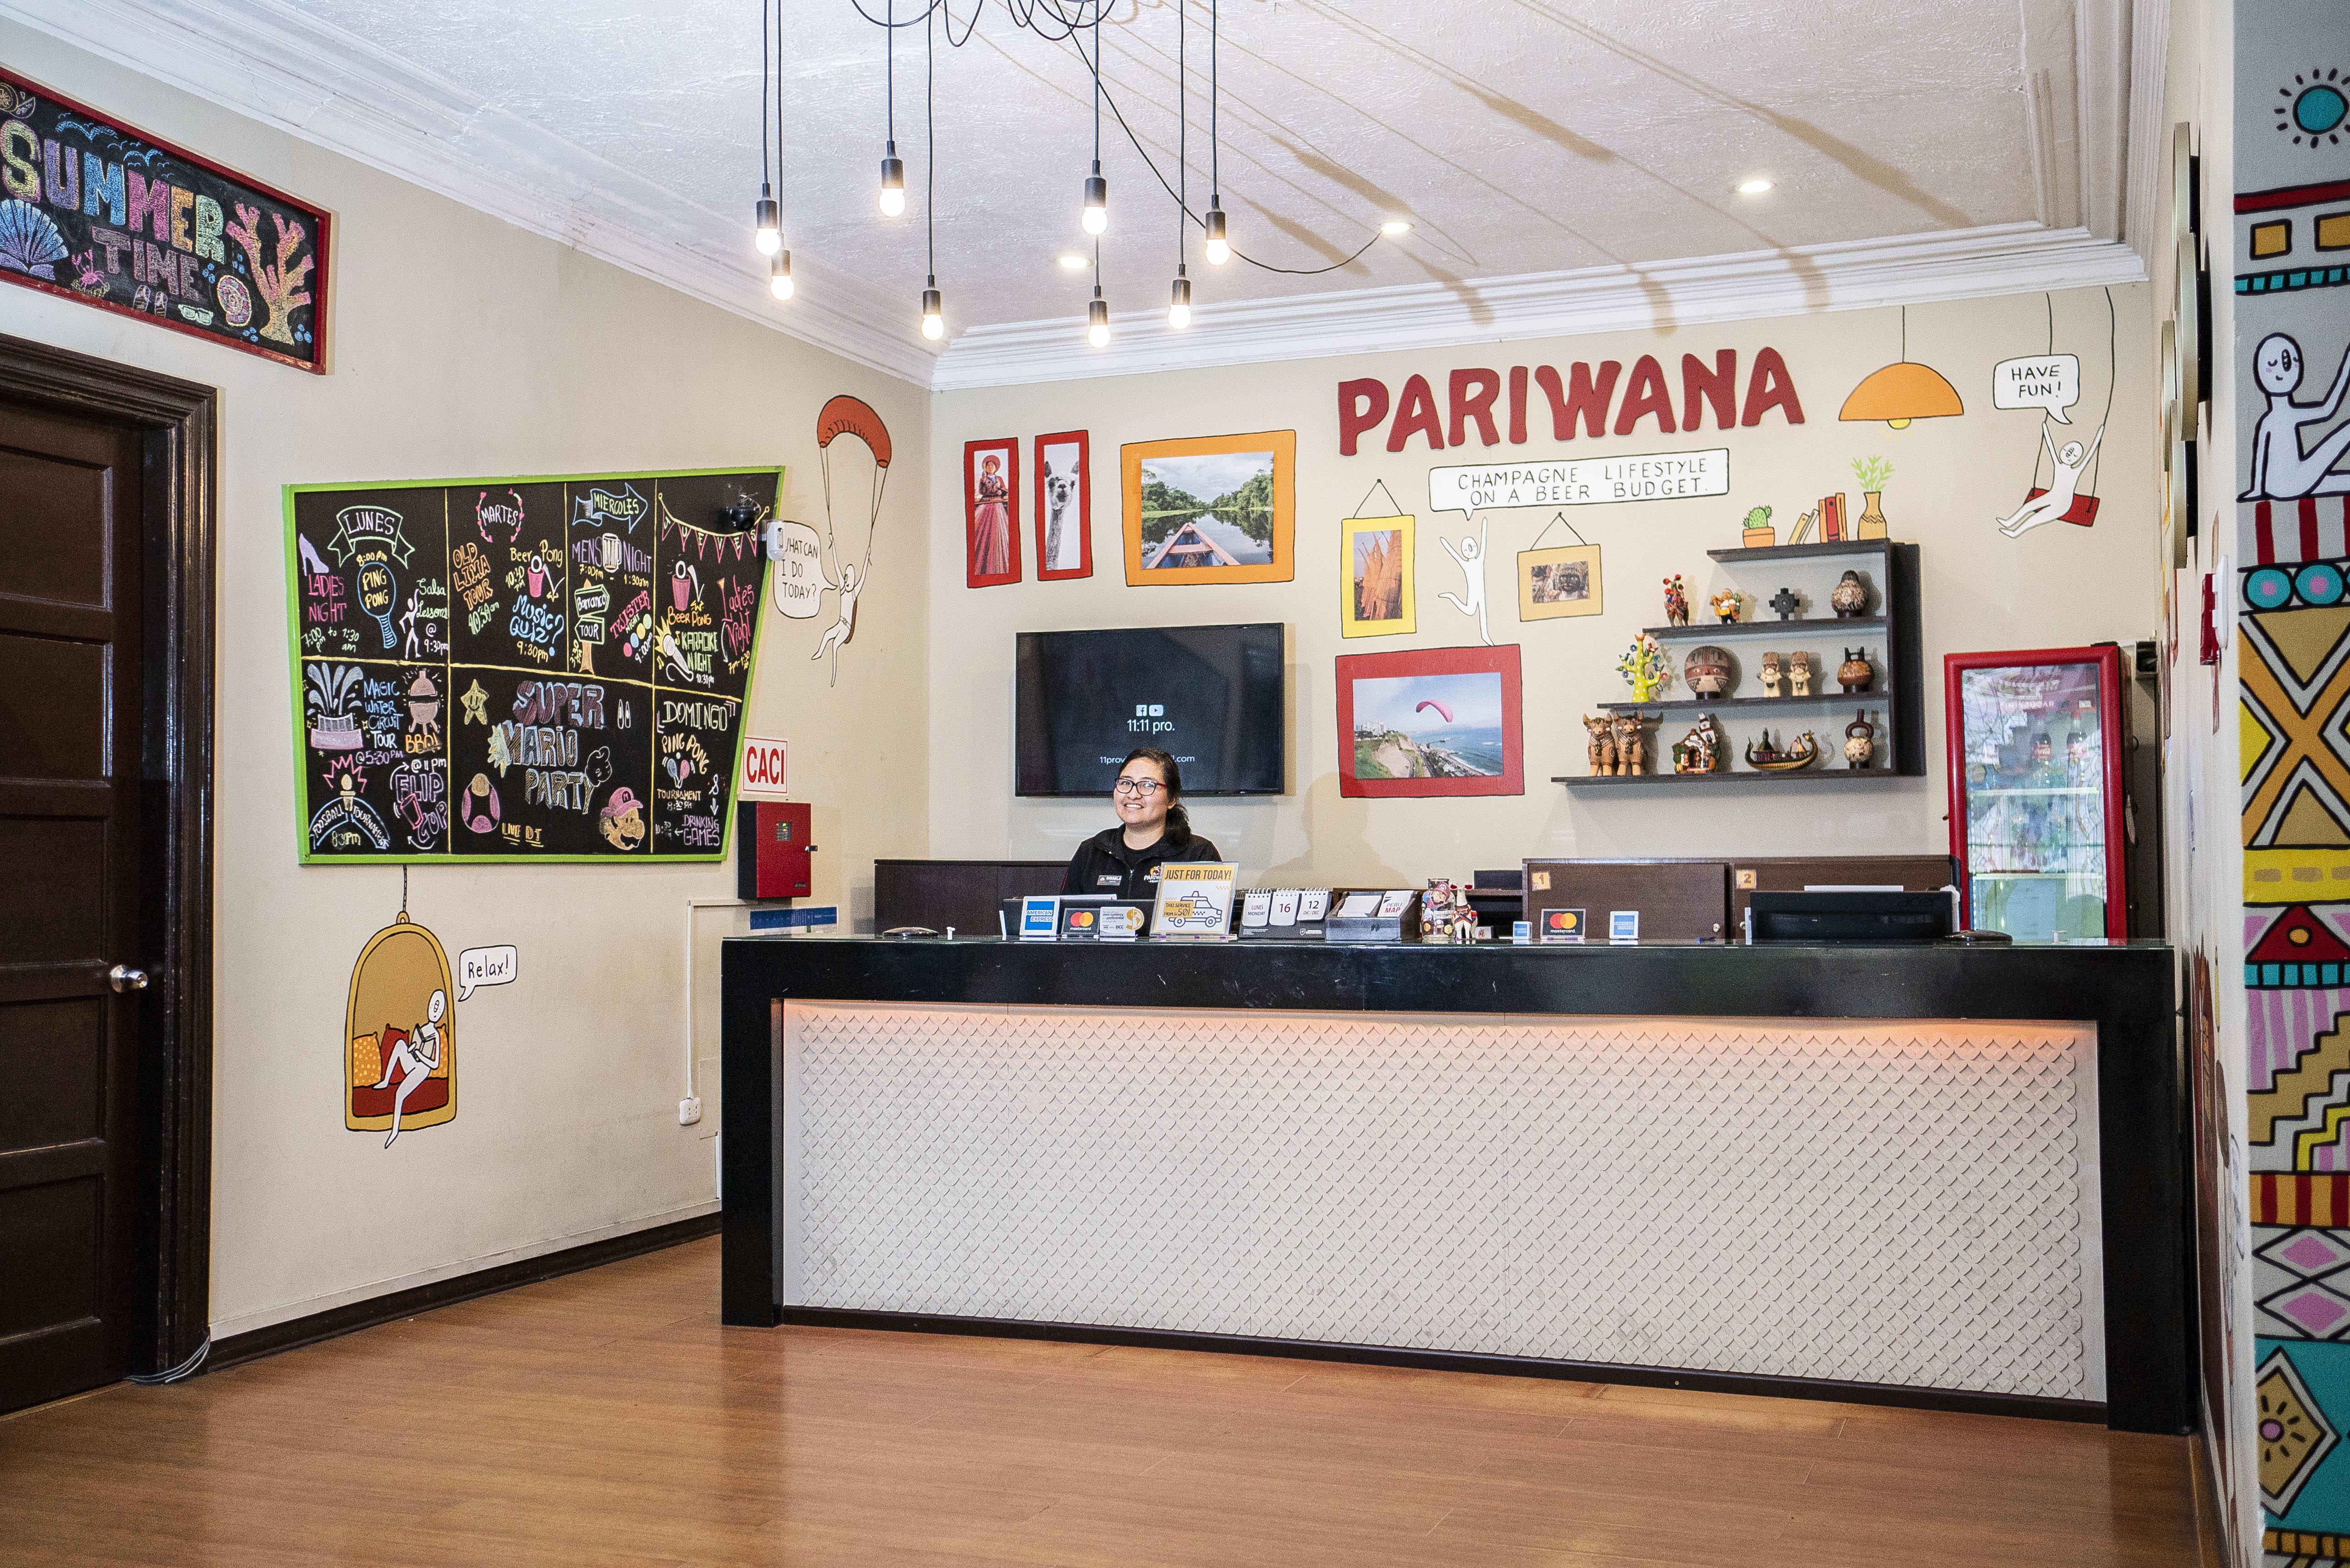 HOSTEL - Pariwana Hostel Lima